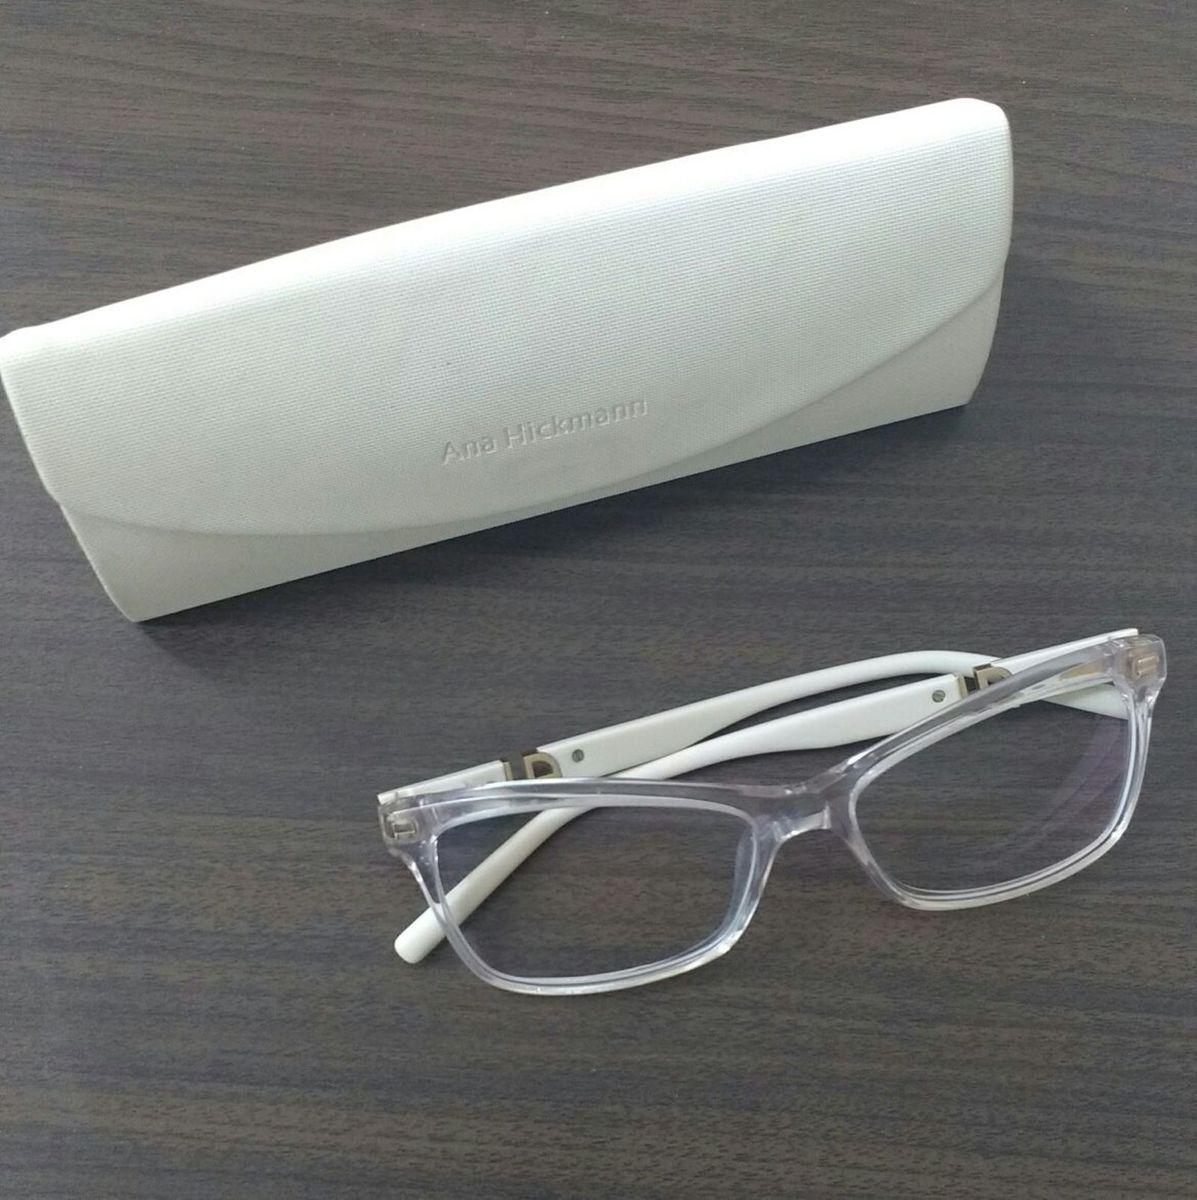 ana hickmann transparente - óculos ana-hickmann.  Czm6ly9wag90b3muzw5qb2vplmnvbs5ici9wcm9kdwn0cy81mde1odq0l2u3ndnjoguyy2mwzwrimmyzzmfhnmq4mdrjzdm2ote1lmpwzw  ... cb99b24f31